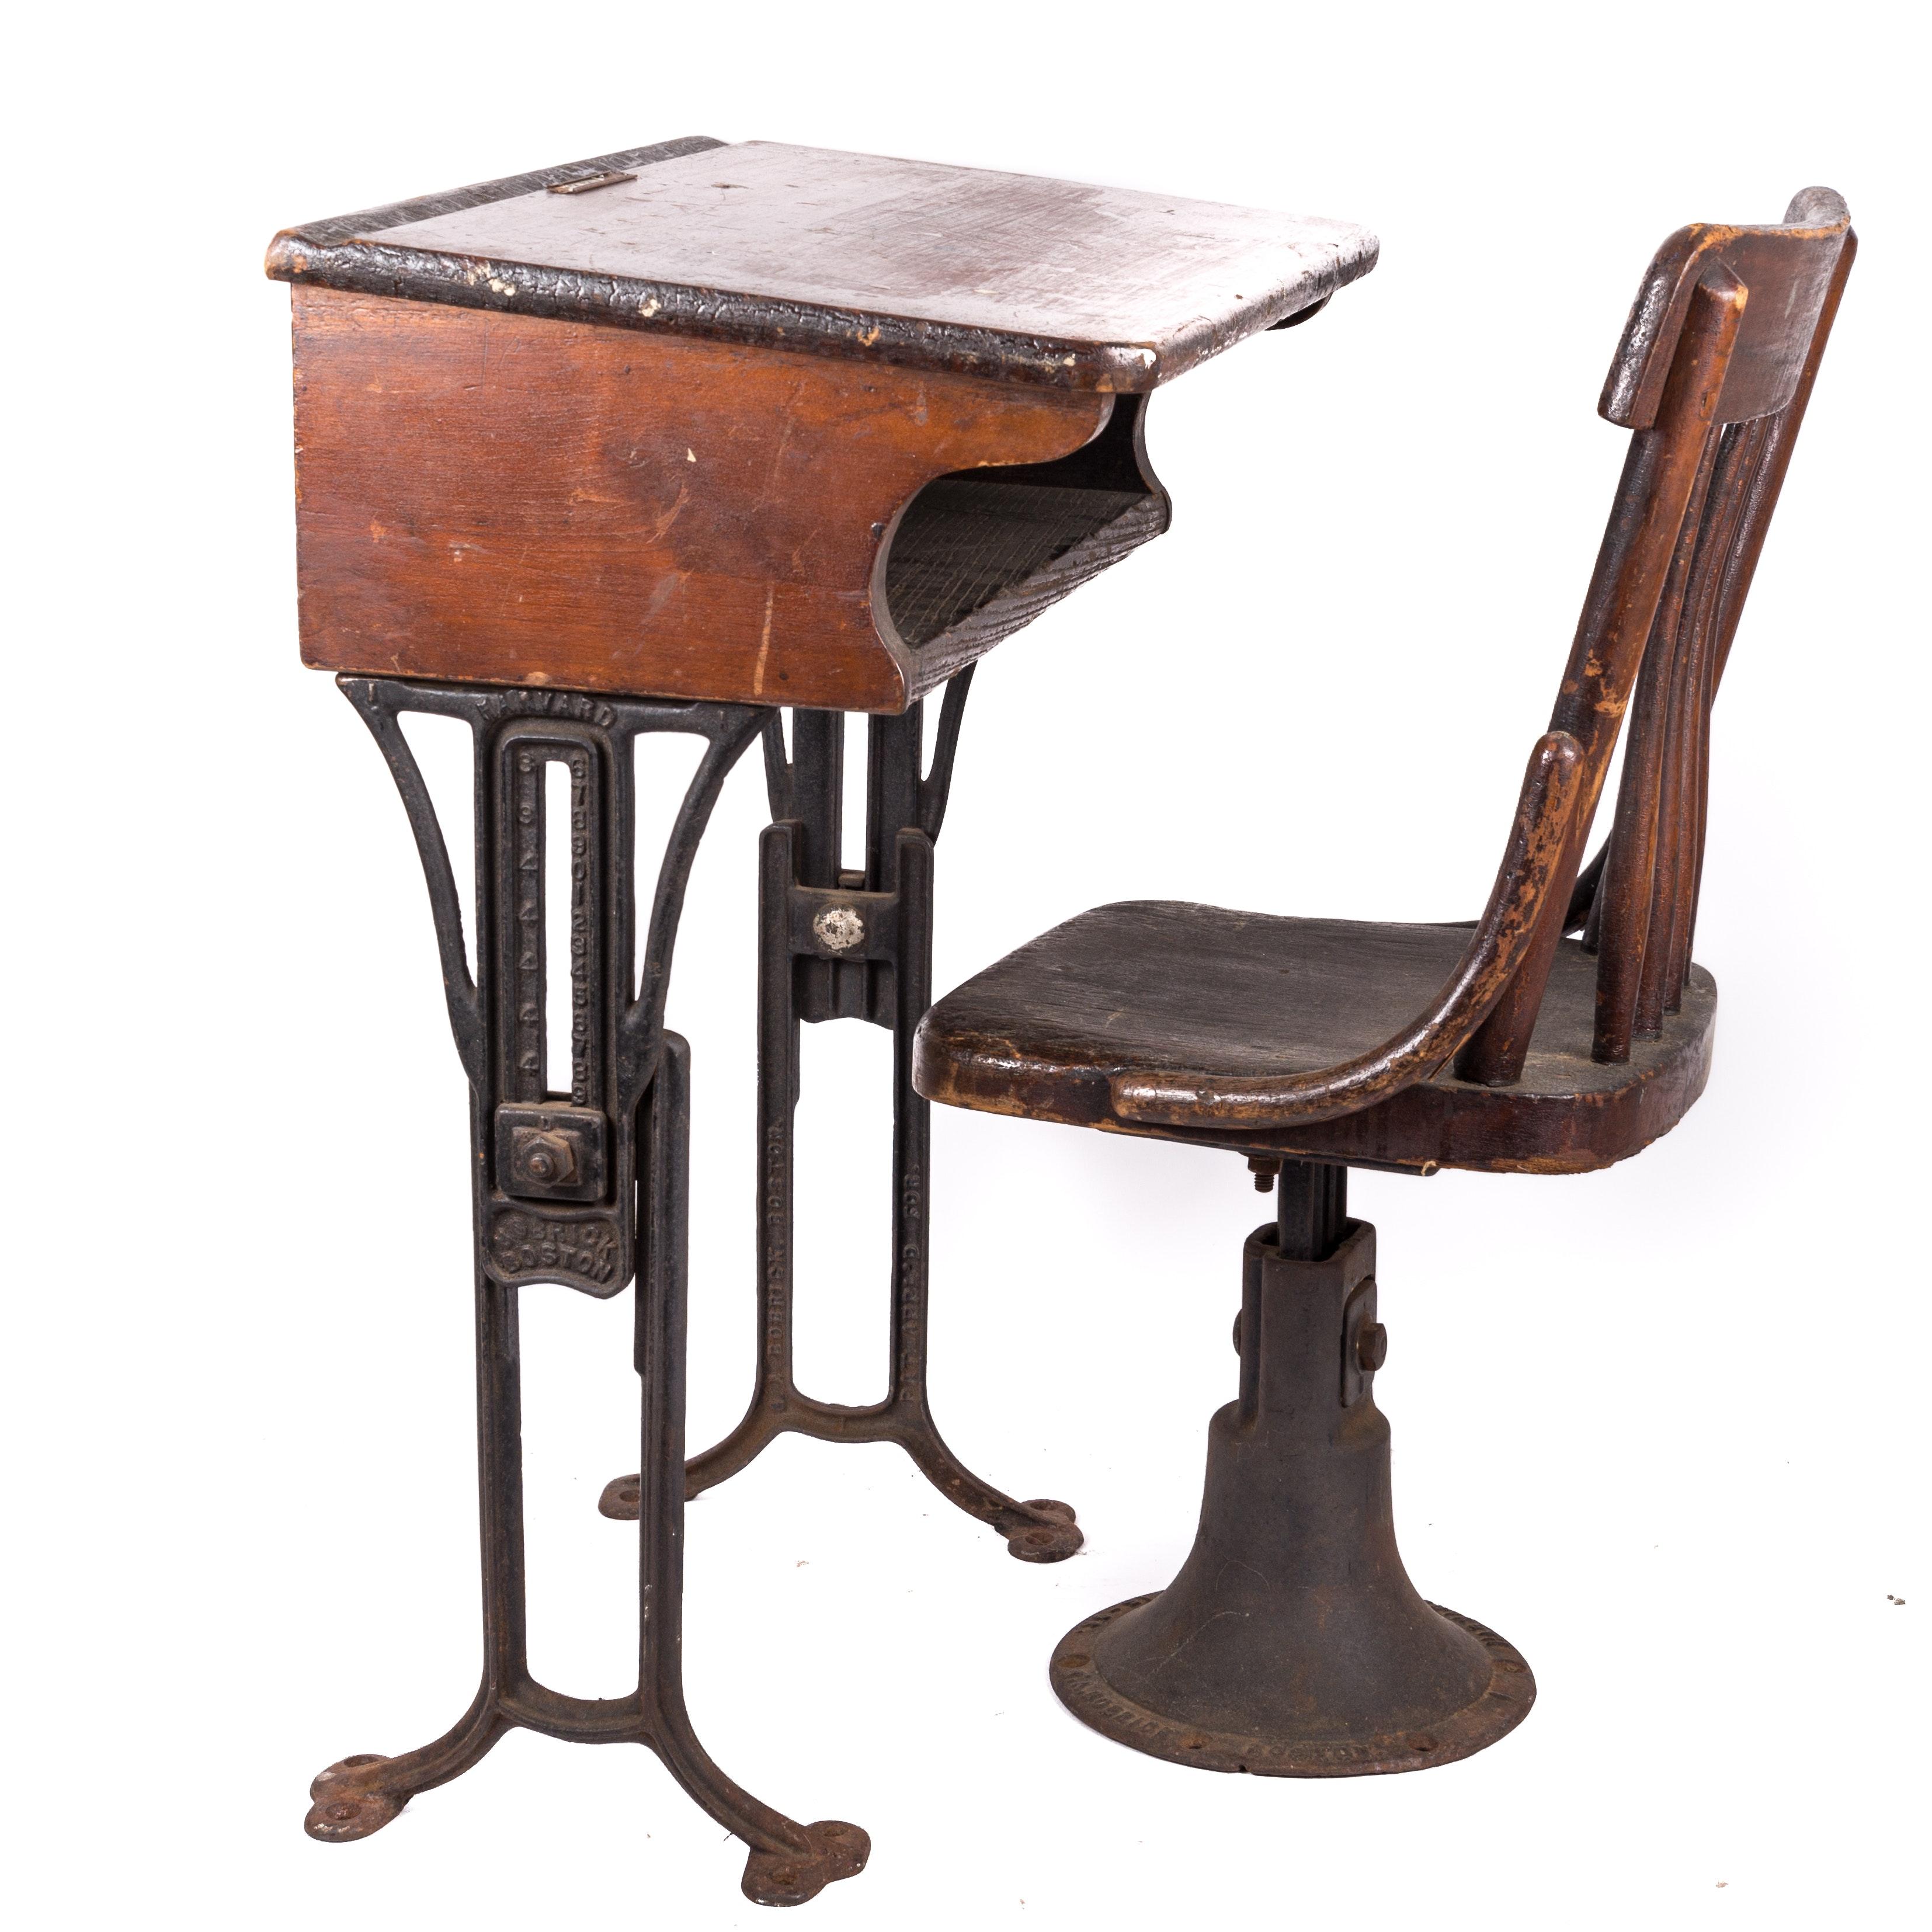 Antique Child's Cast Iron Desk and Chair